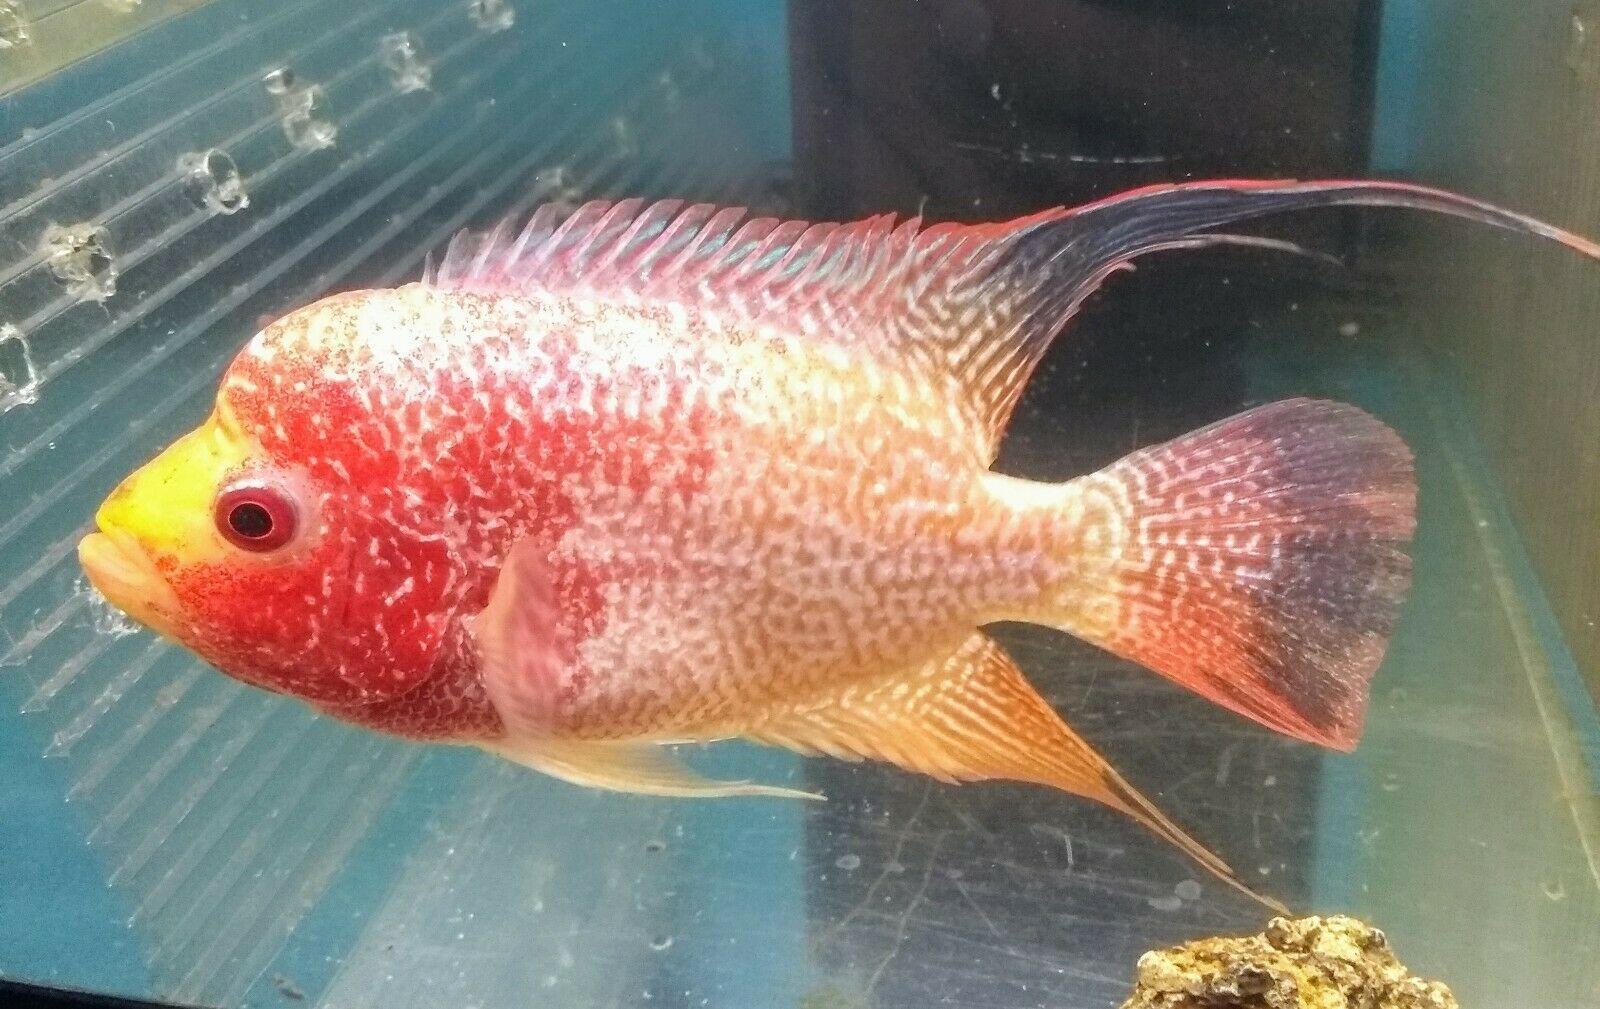 Flowerhorn GB Kamfa Fish for sale